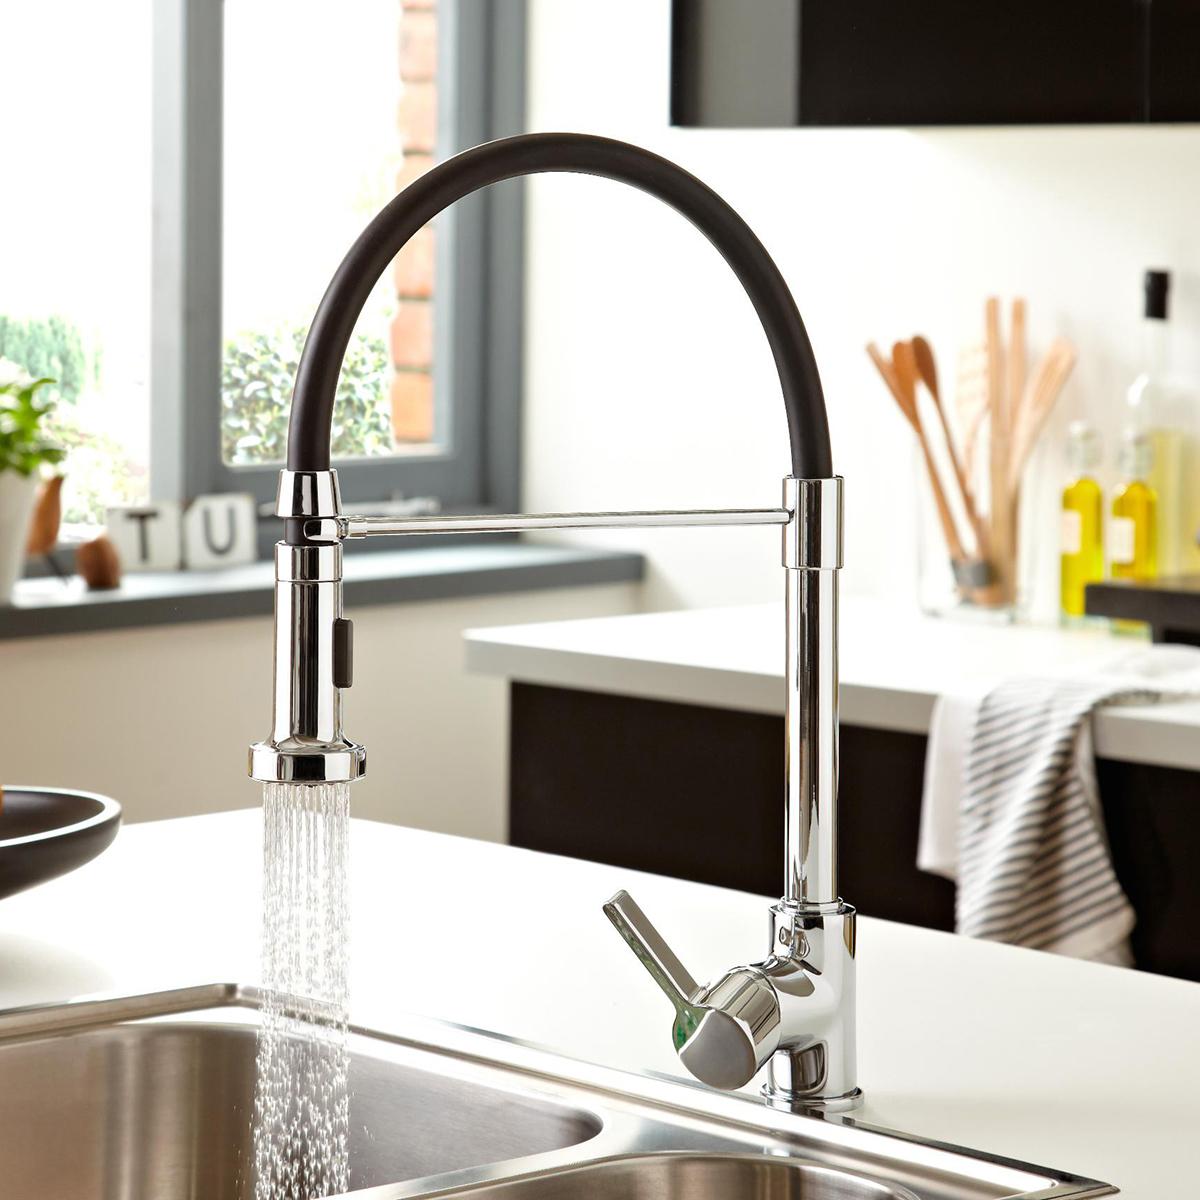 Bristan Liquorice Mono Kitchen Sink Mixer Tap, Pull-Down Spray, Chrome-0